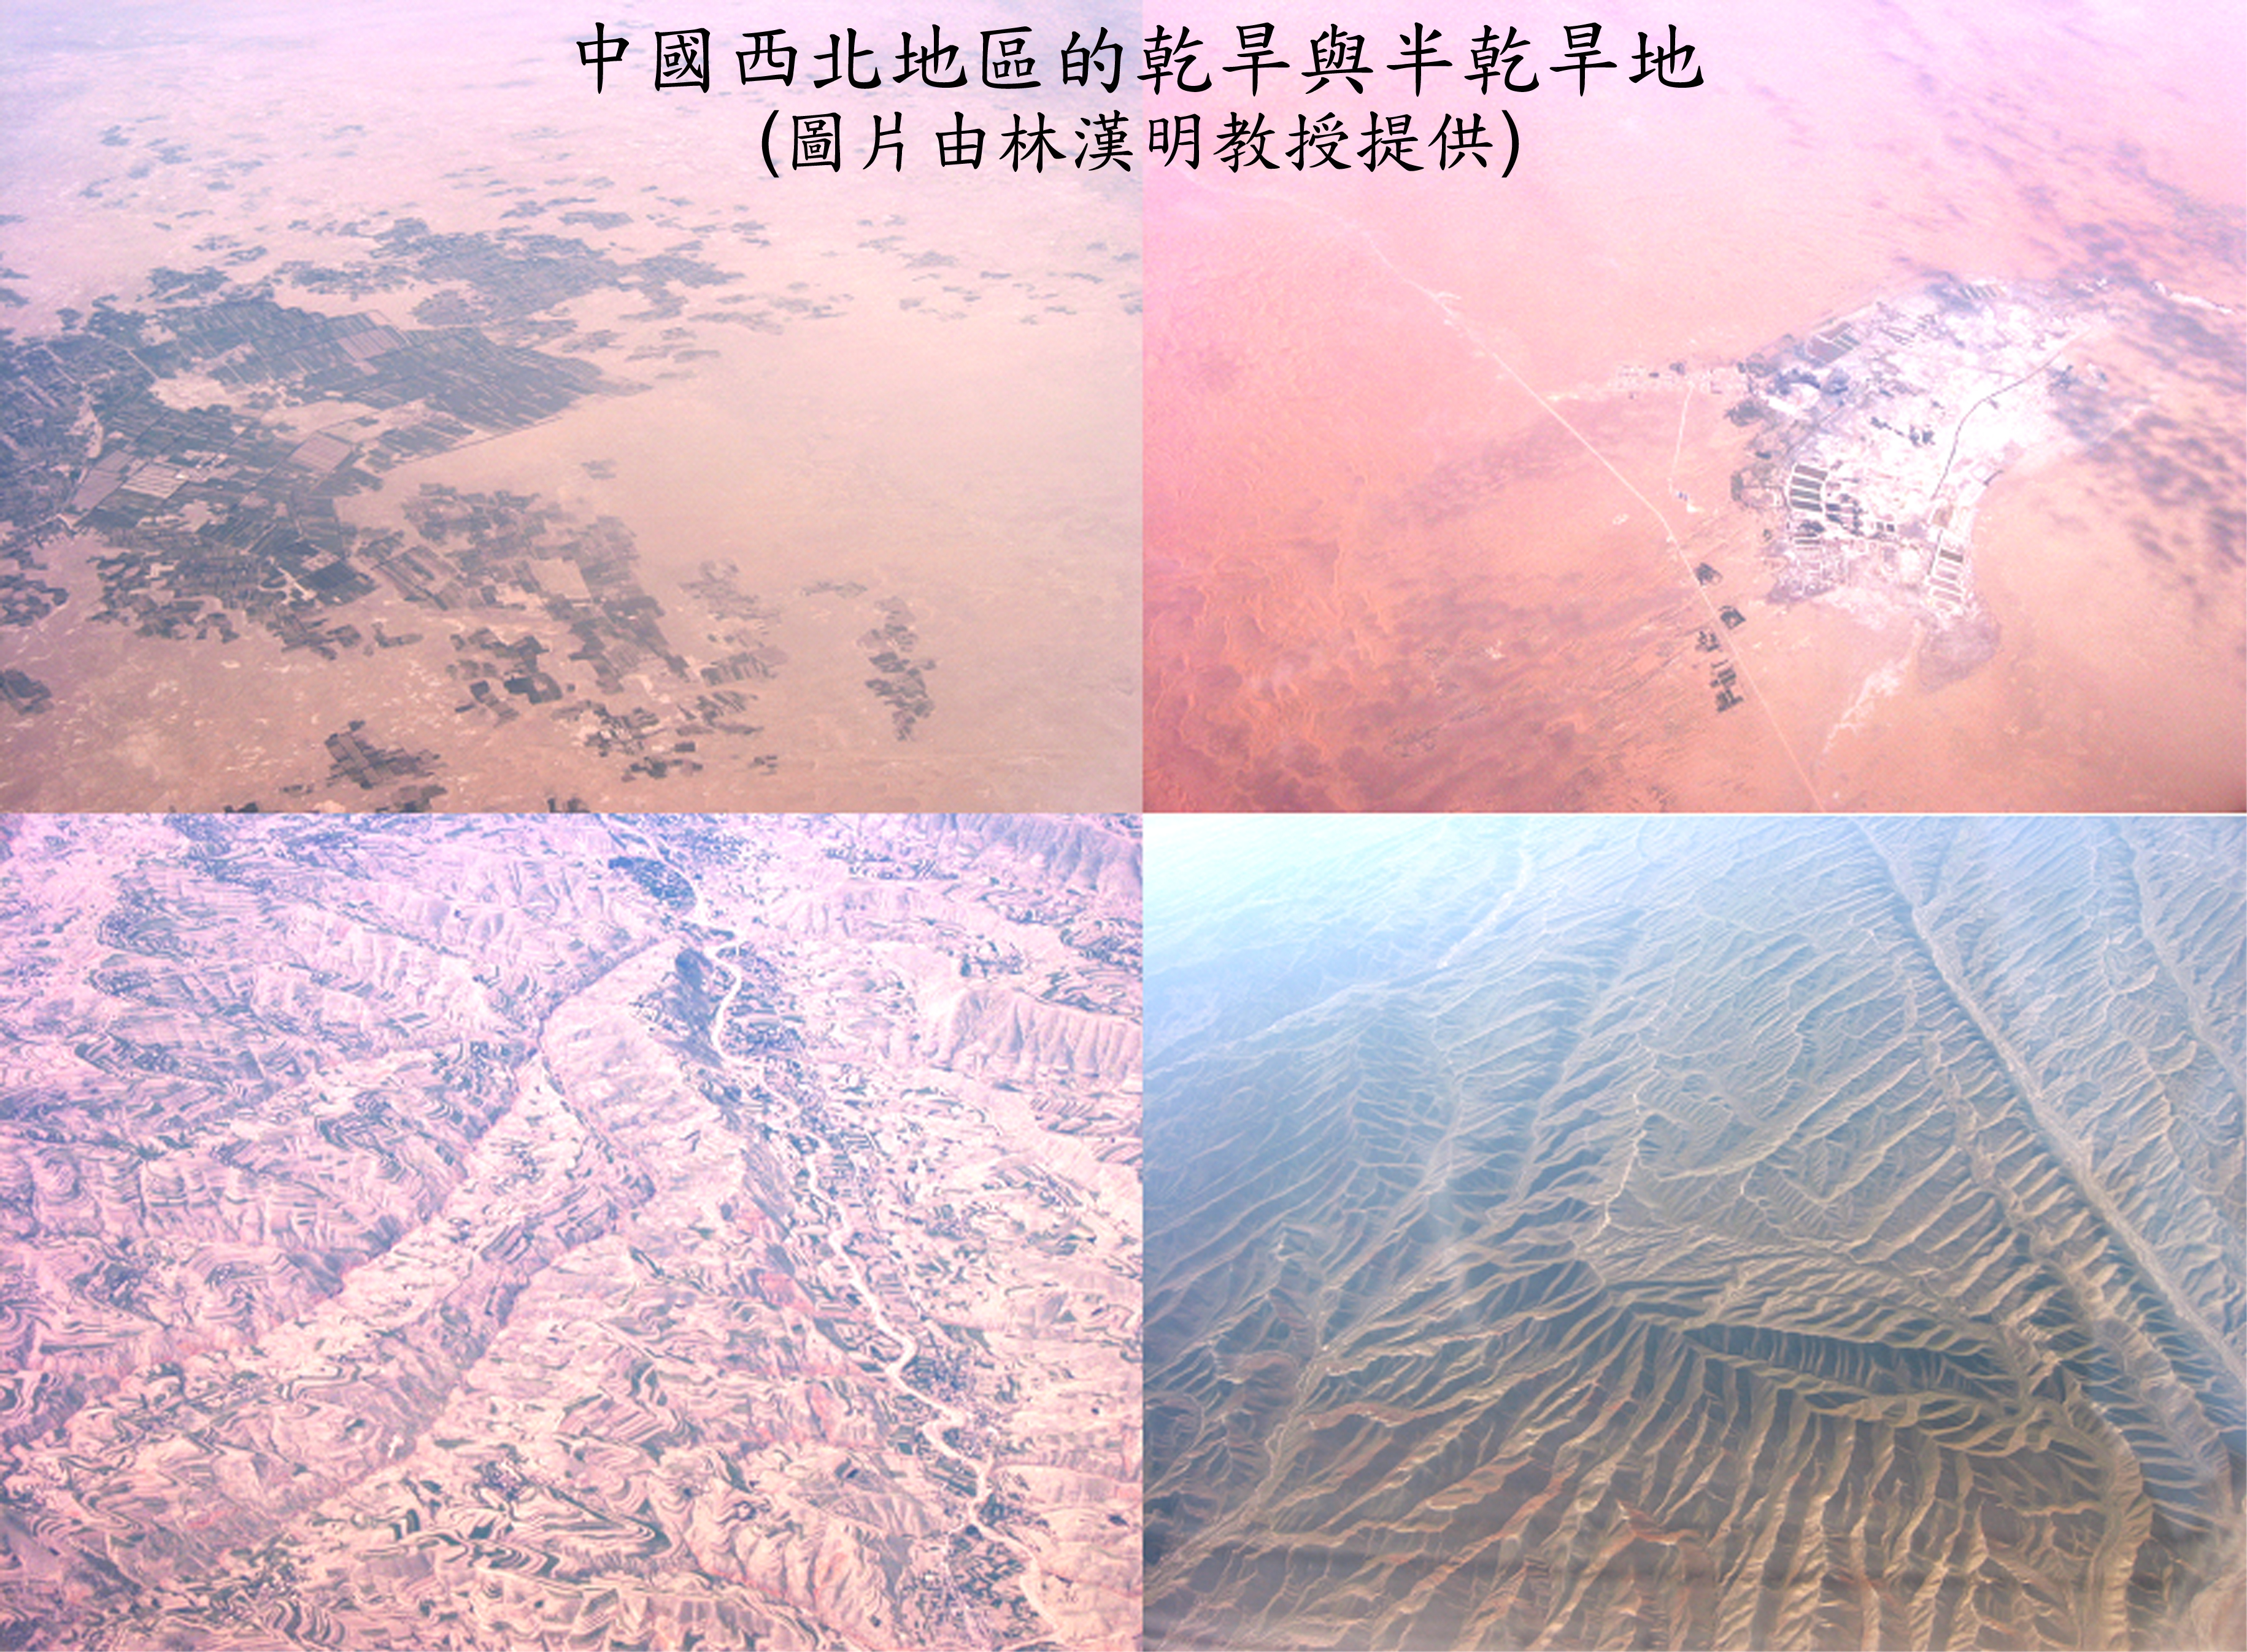 Semi-arid and arid regions in NW China